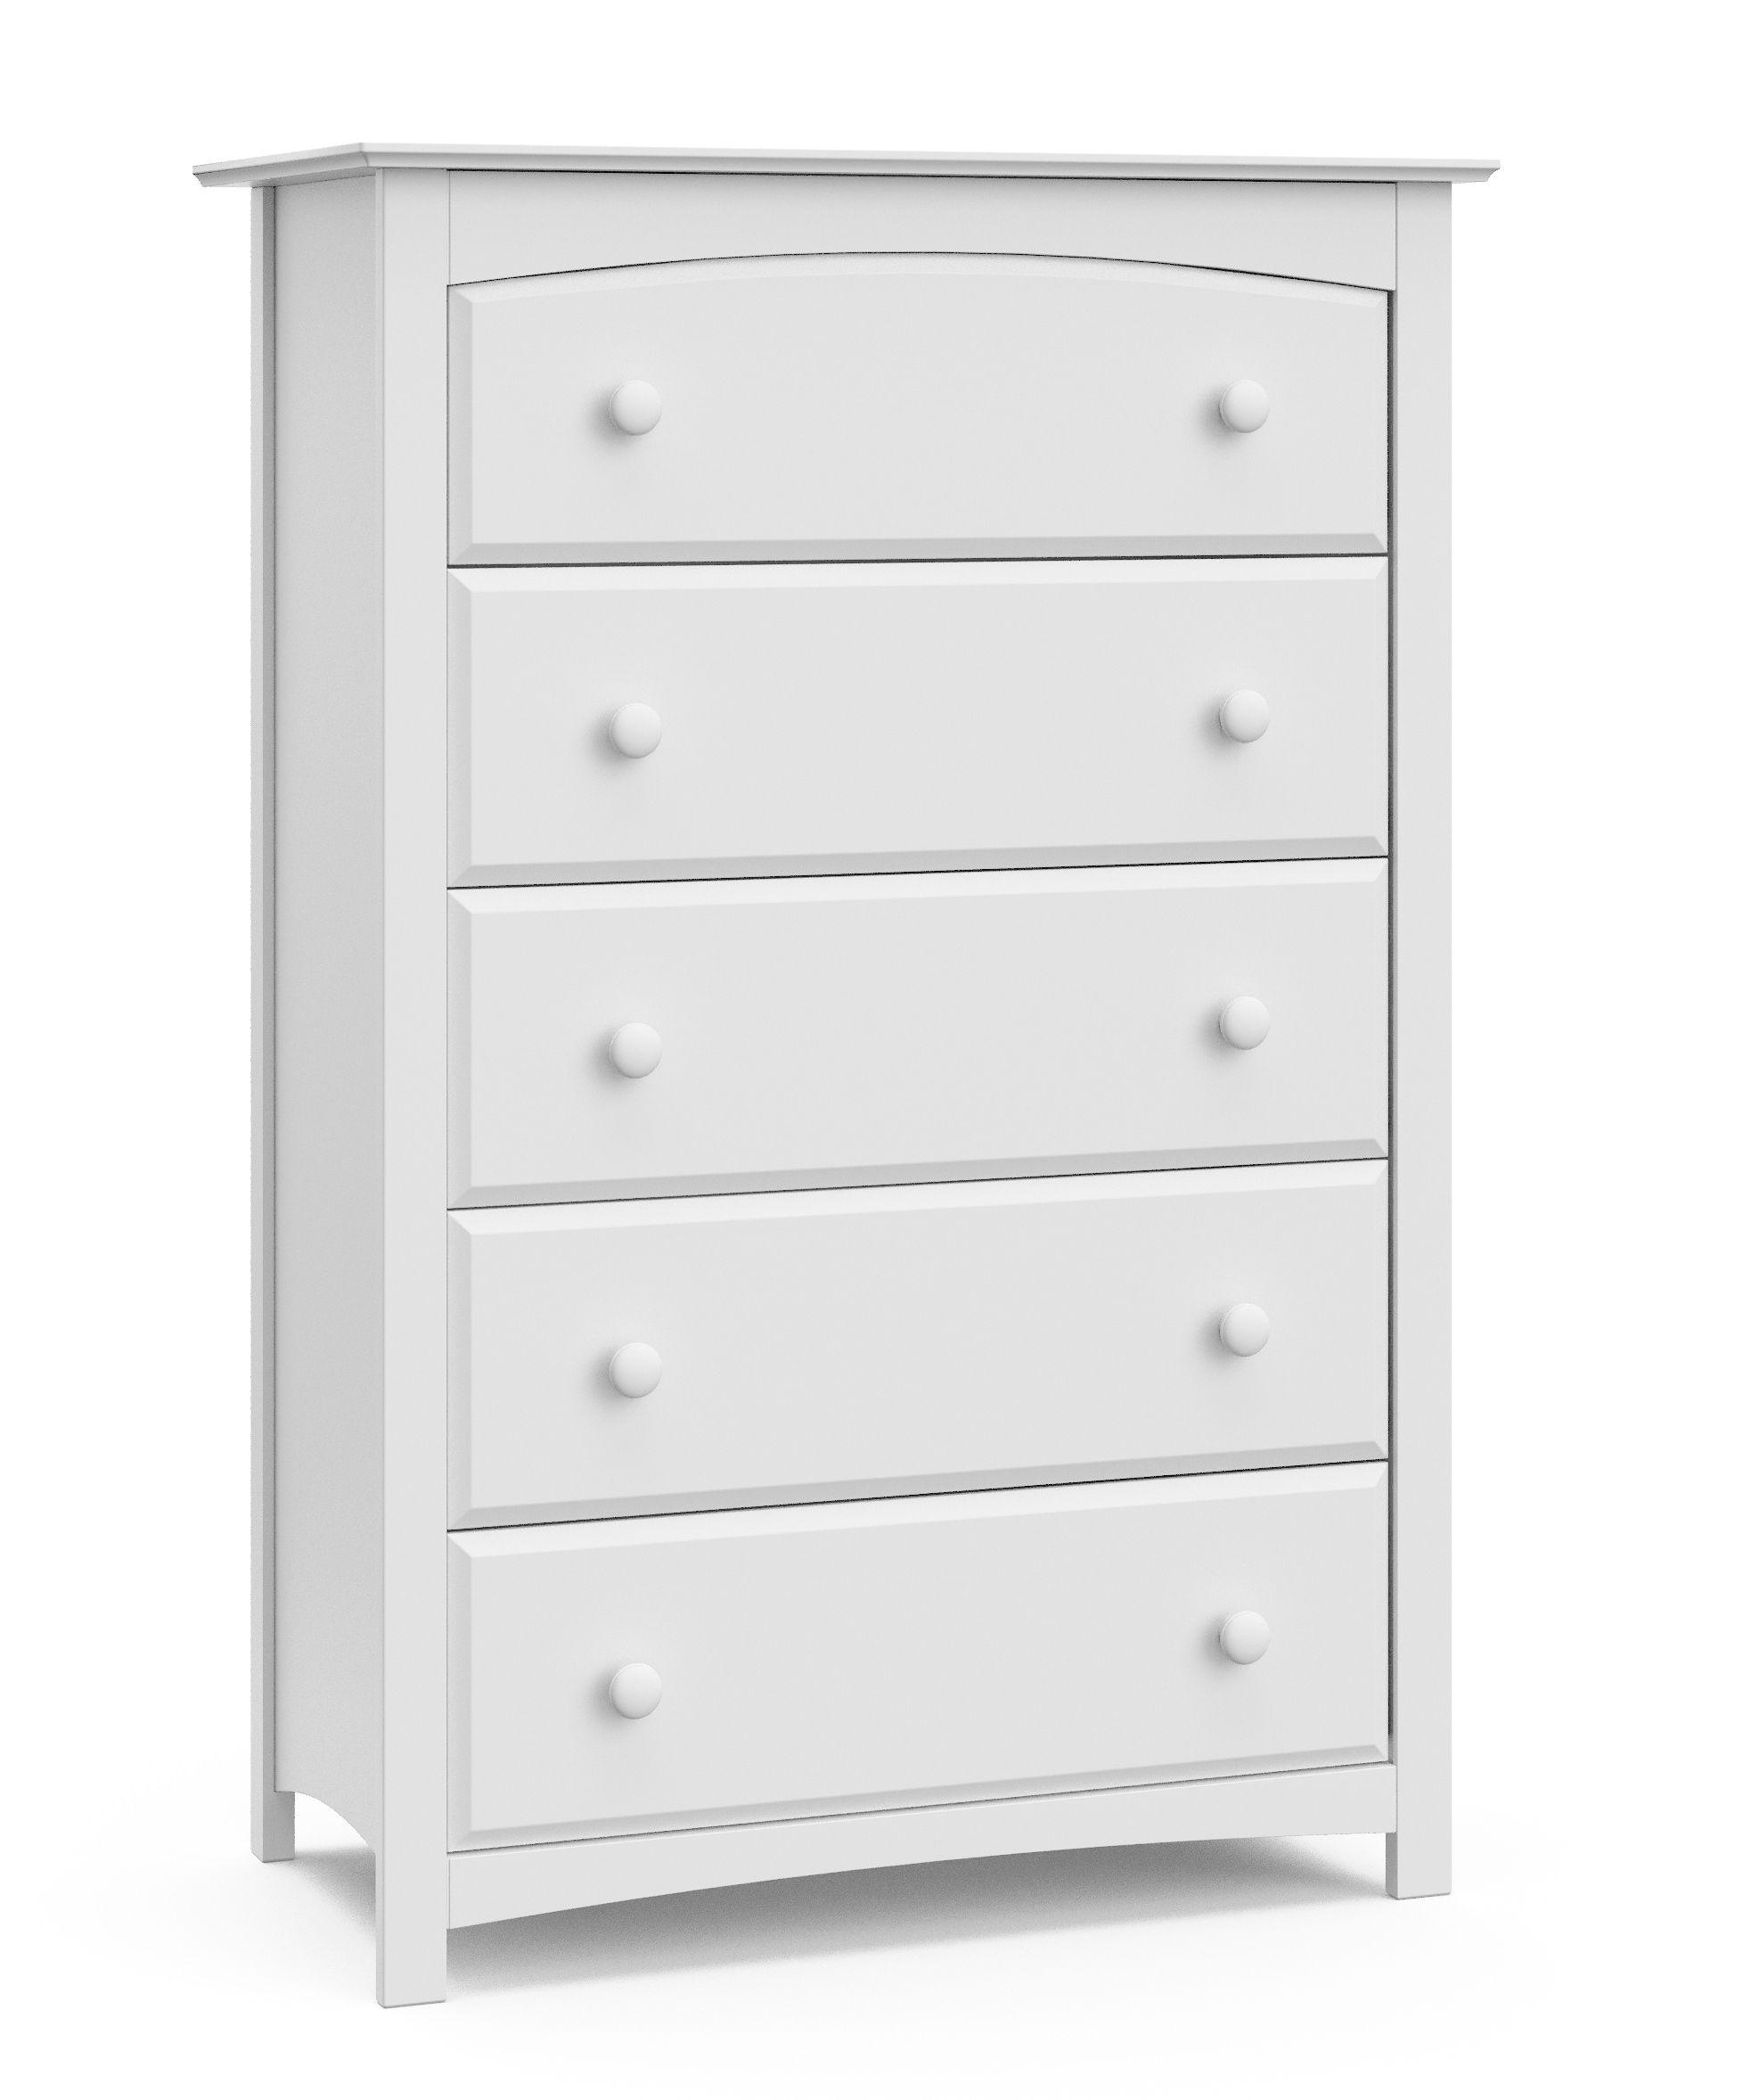 Storkcraft Kenton 5 Drawer Universal Dresser White Walmart Com Bedroom Dressers Storkcraft Storage Solutions Bedroom [ 2356 x 1956 Pixel ]